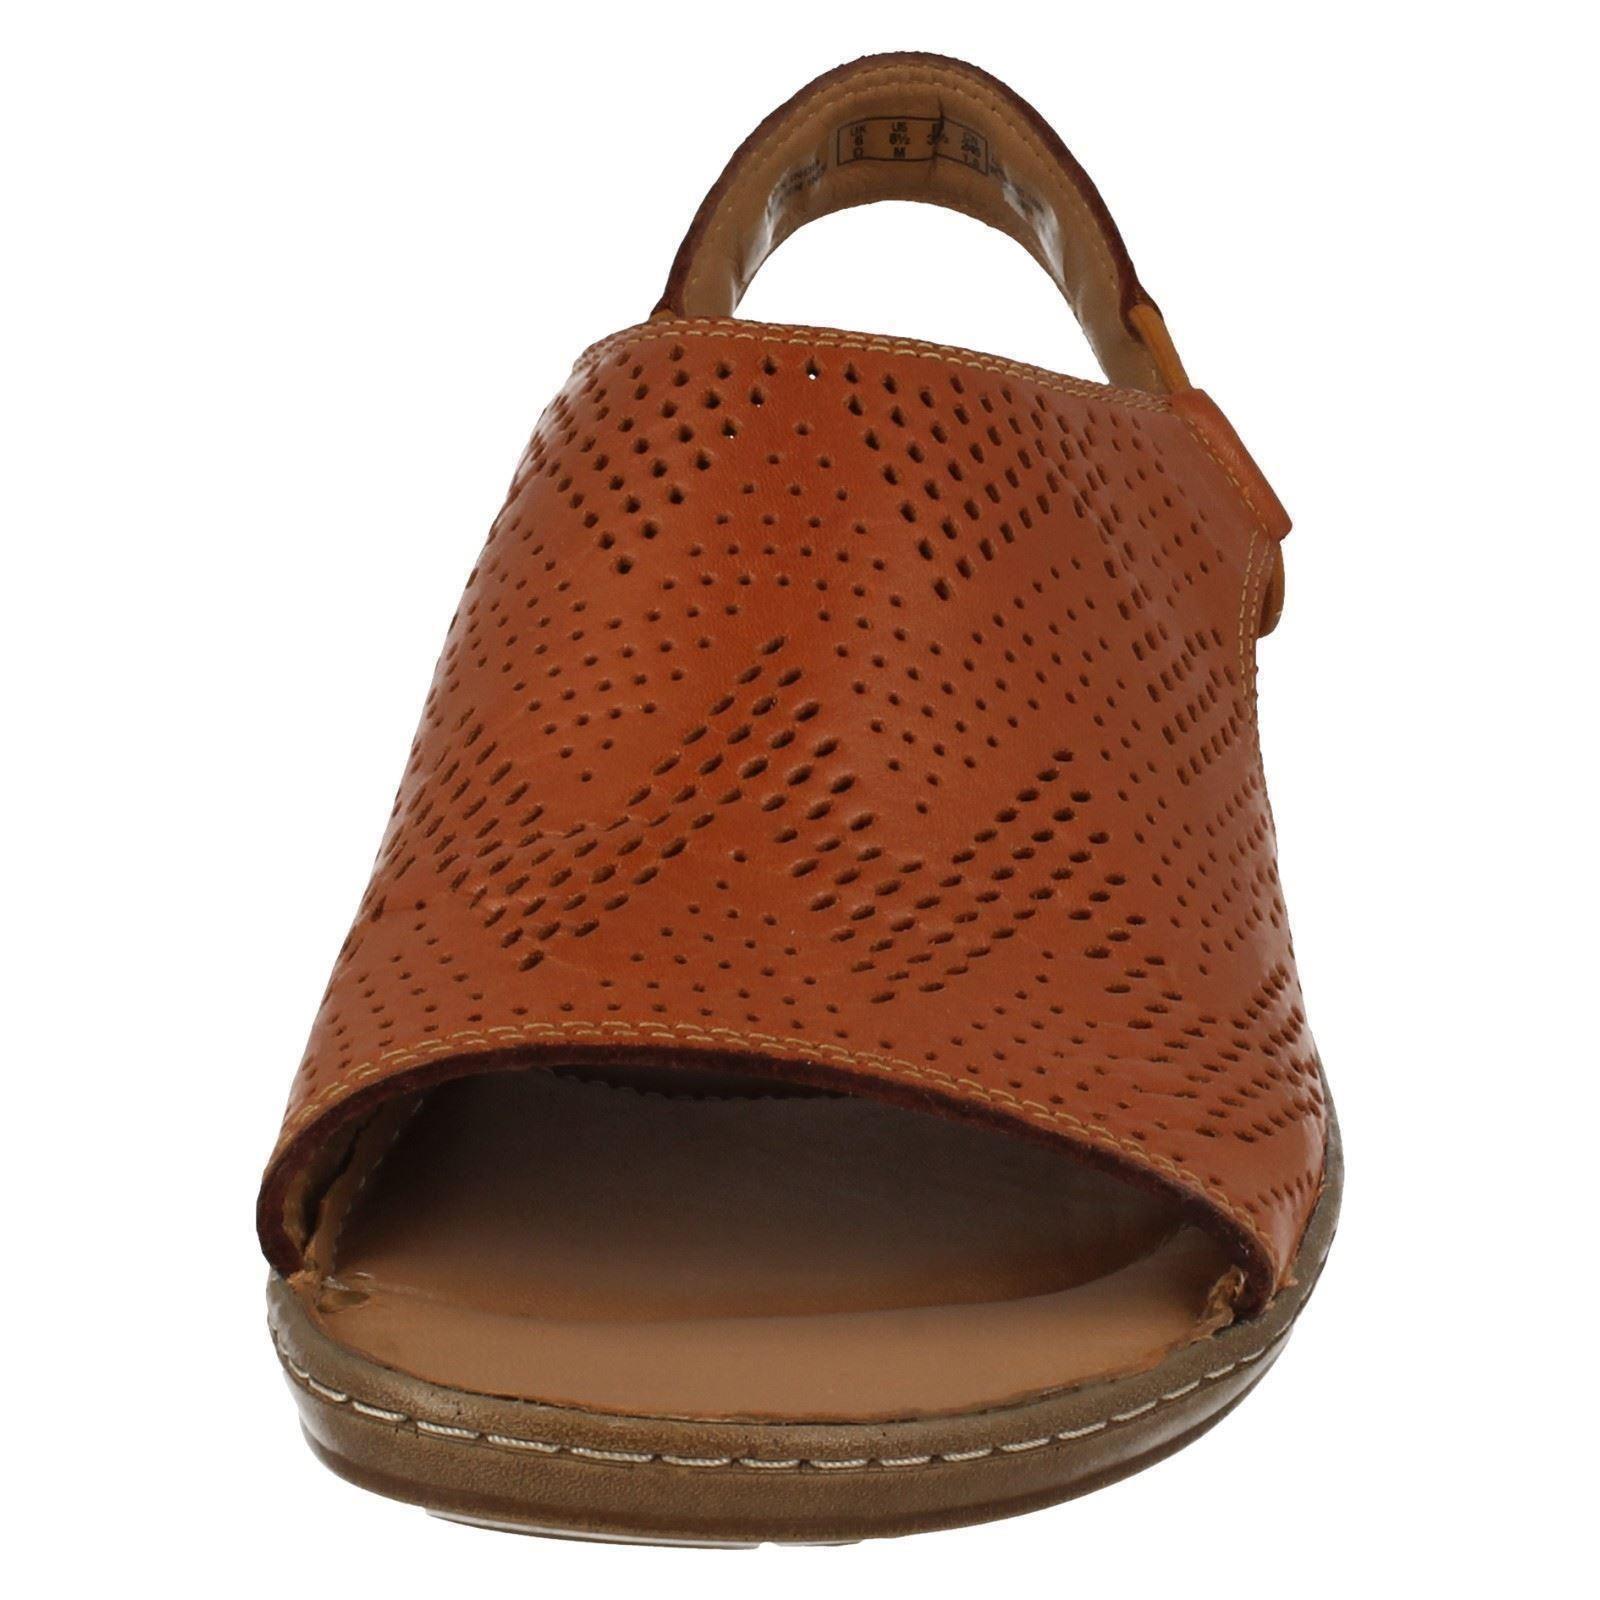 Ladies Clarks Slip On Flat Sandals 'Sarla Cadence'